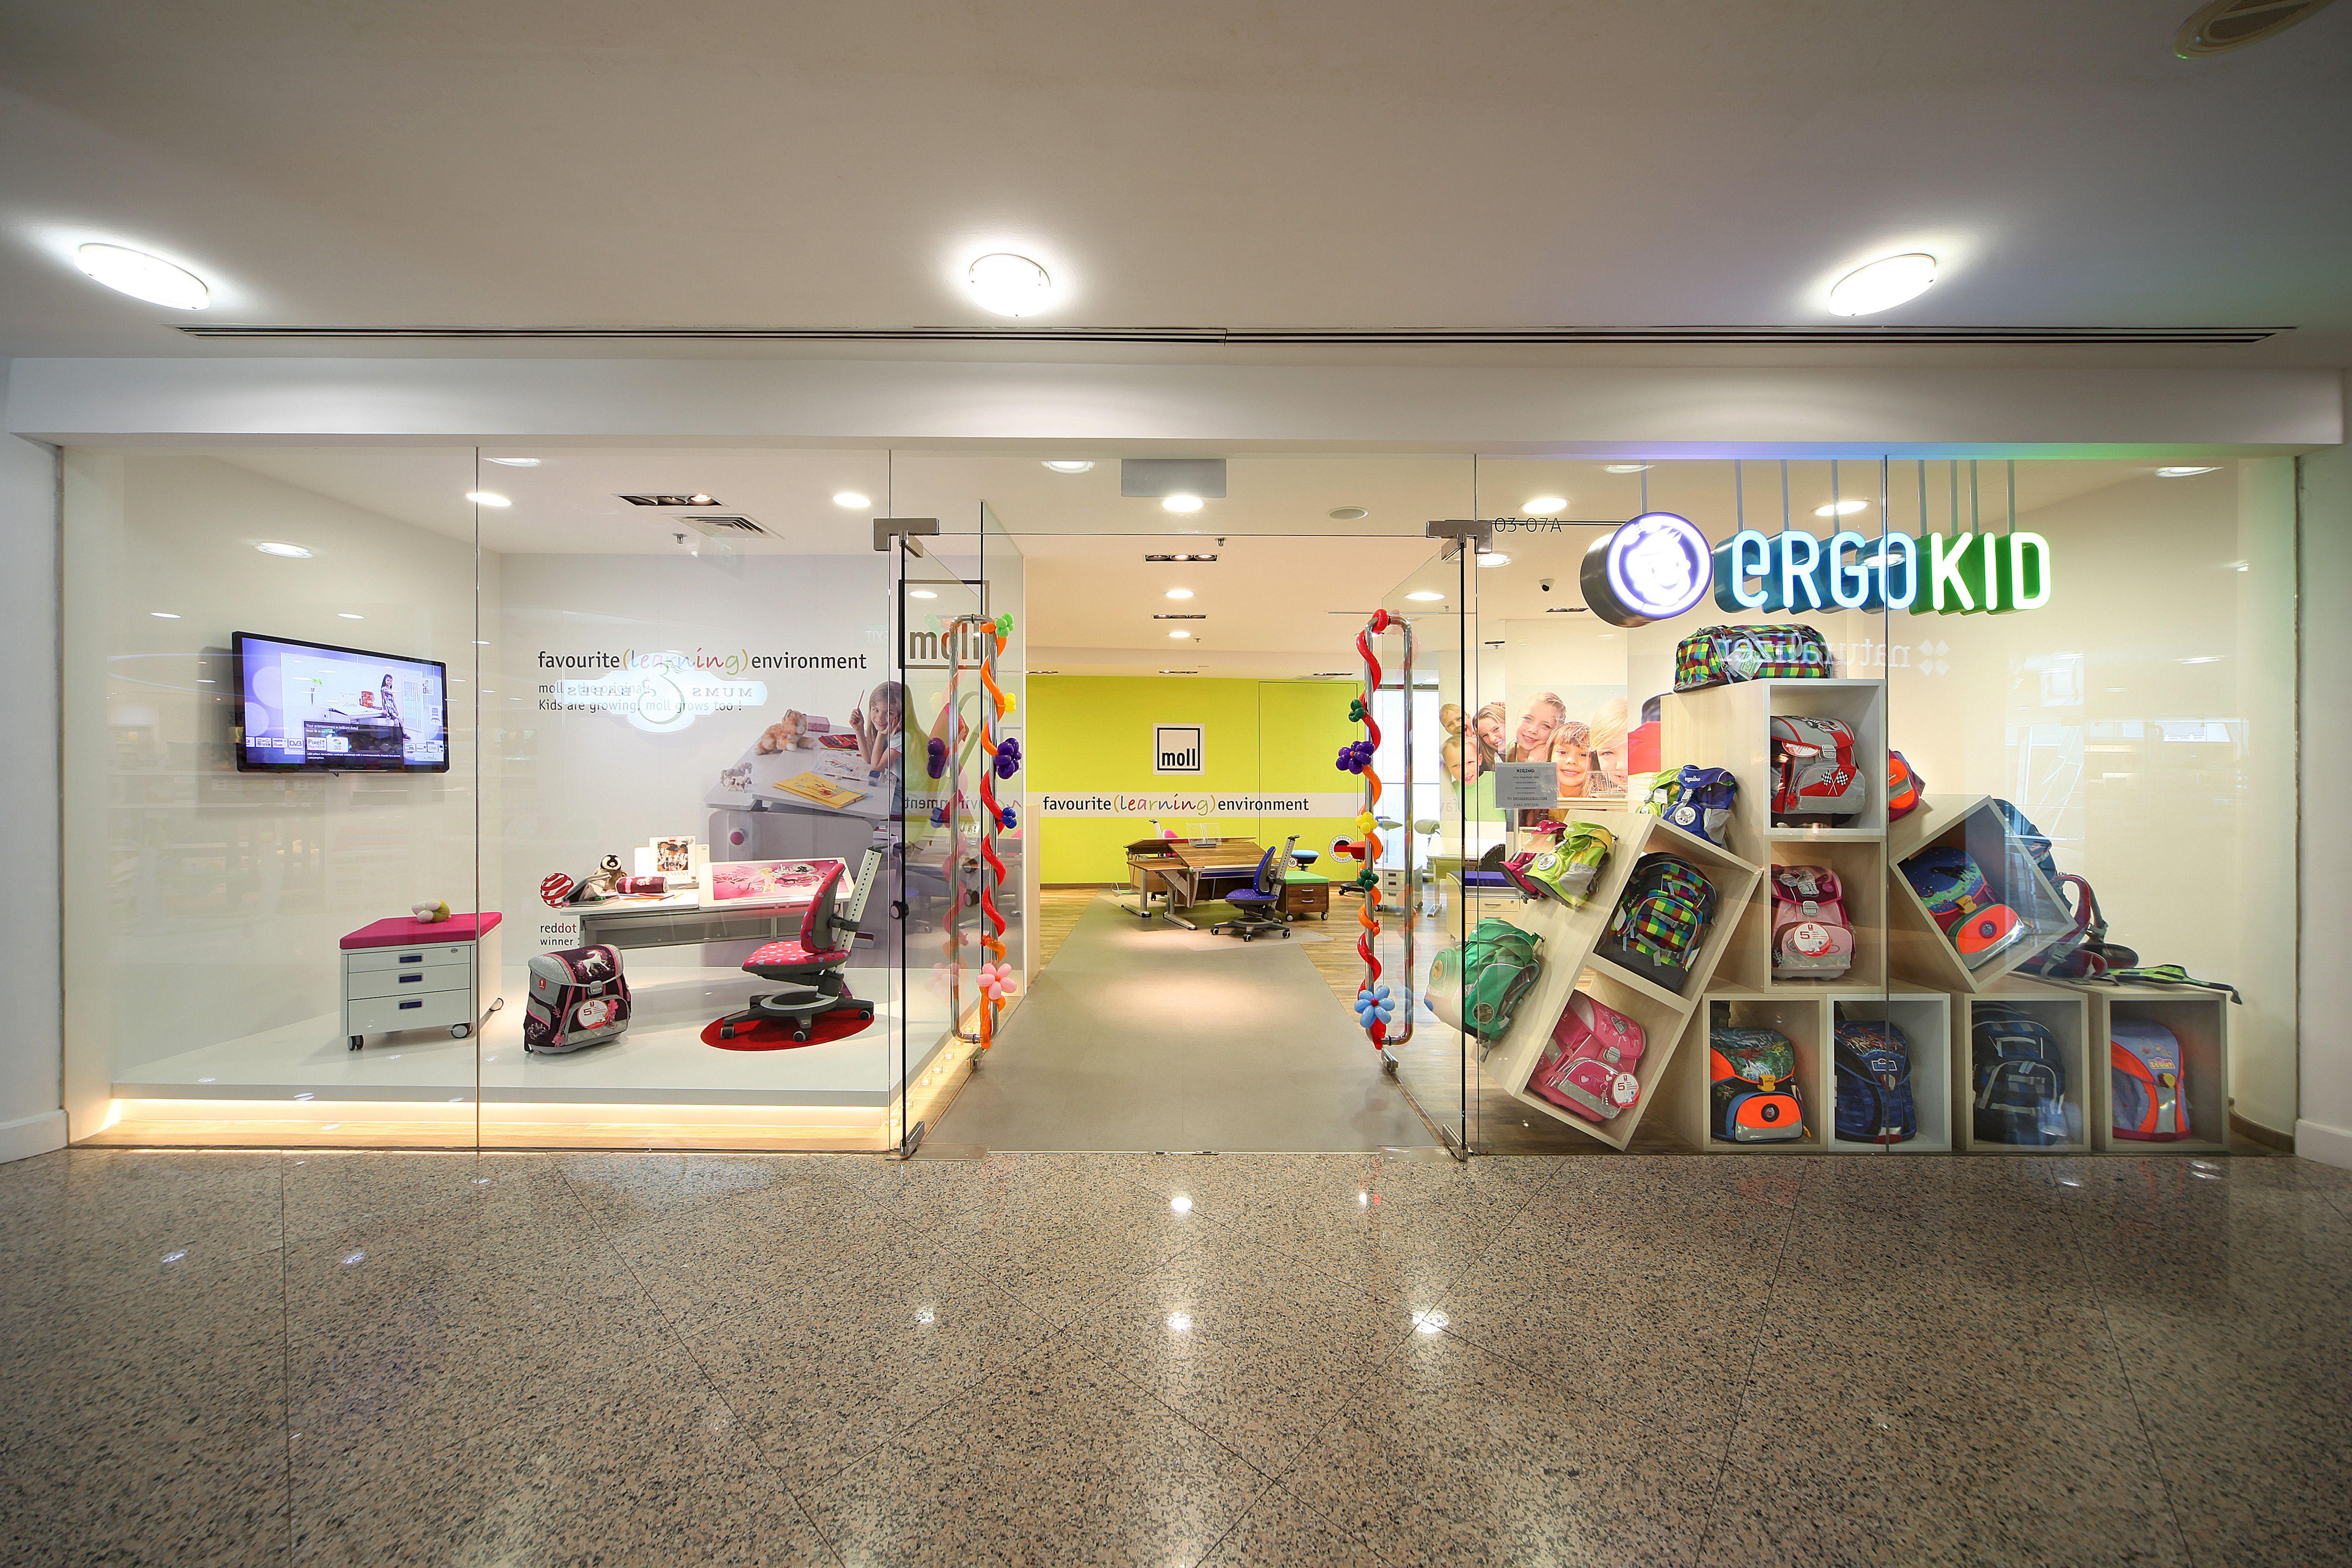 Ergokid Singapore39s Premier Kids Ergonomics Store